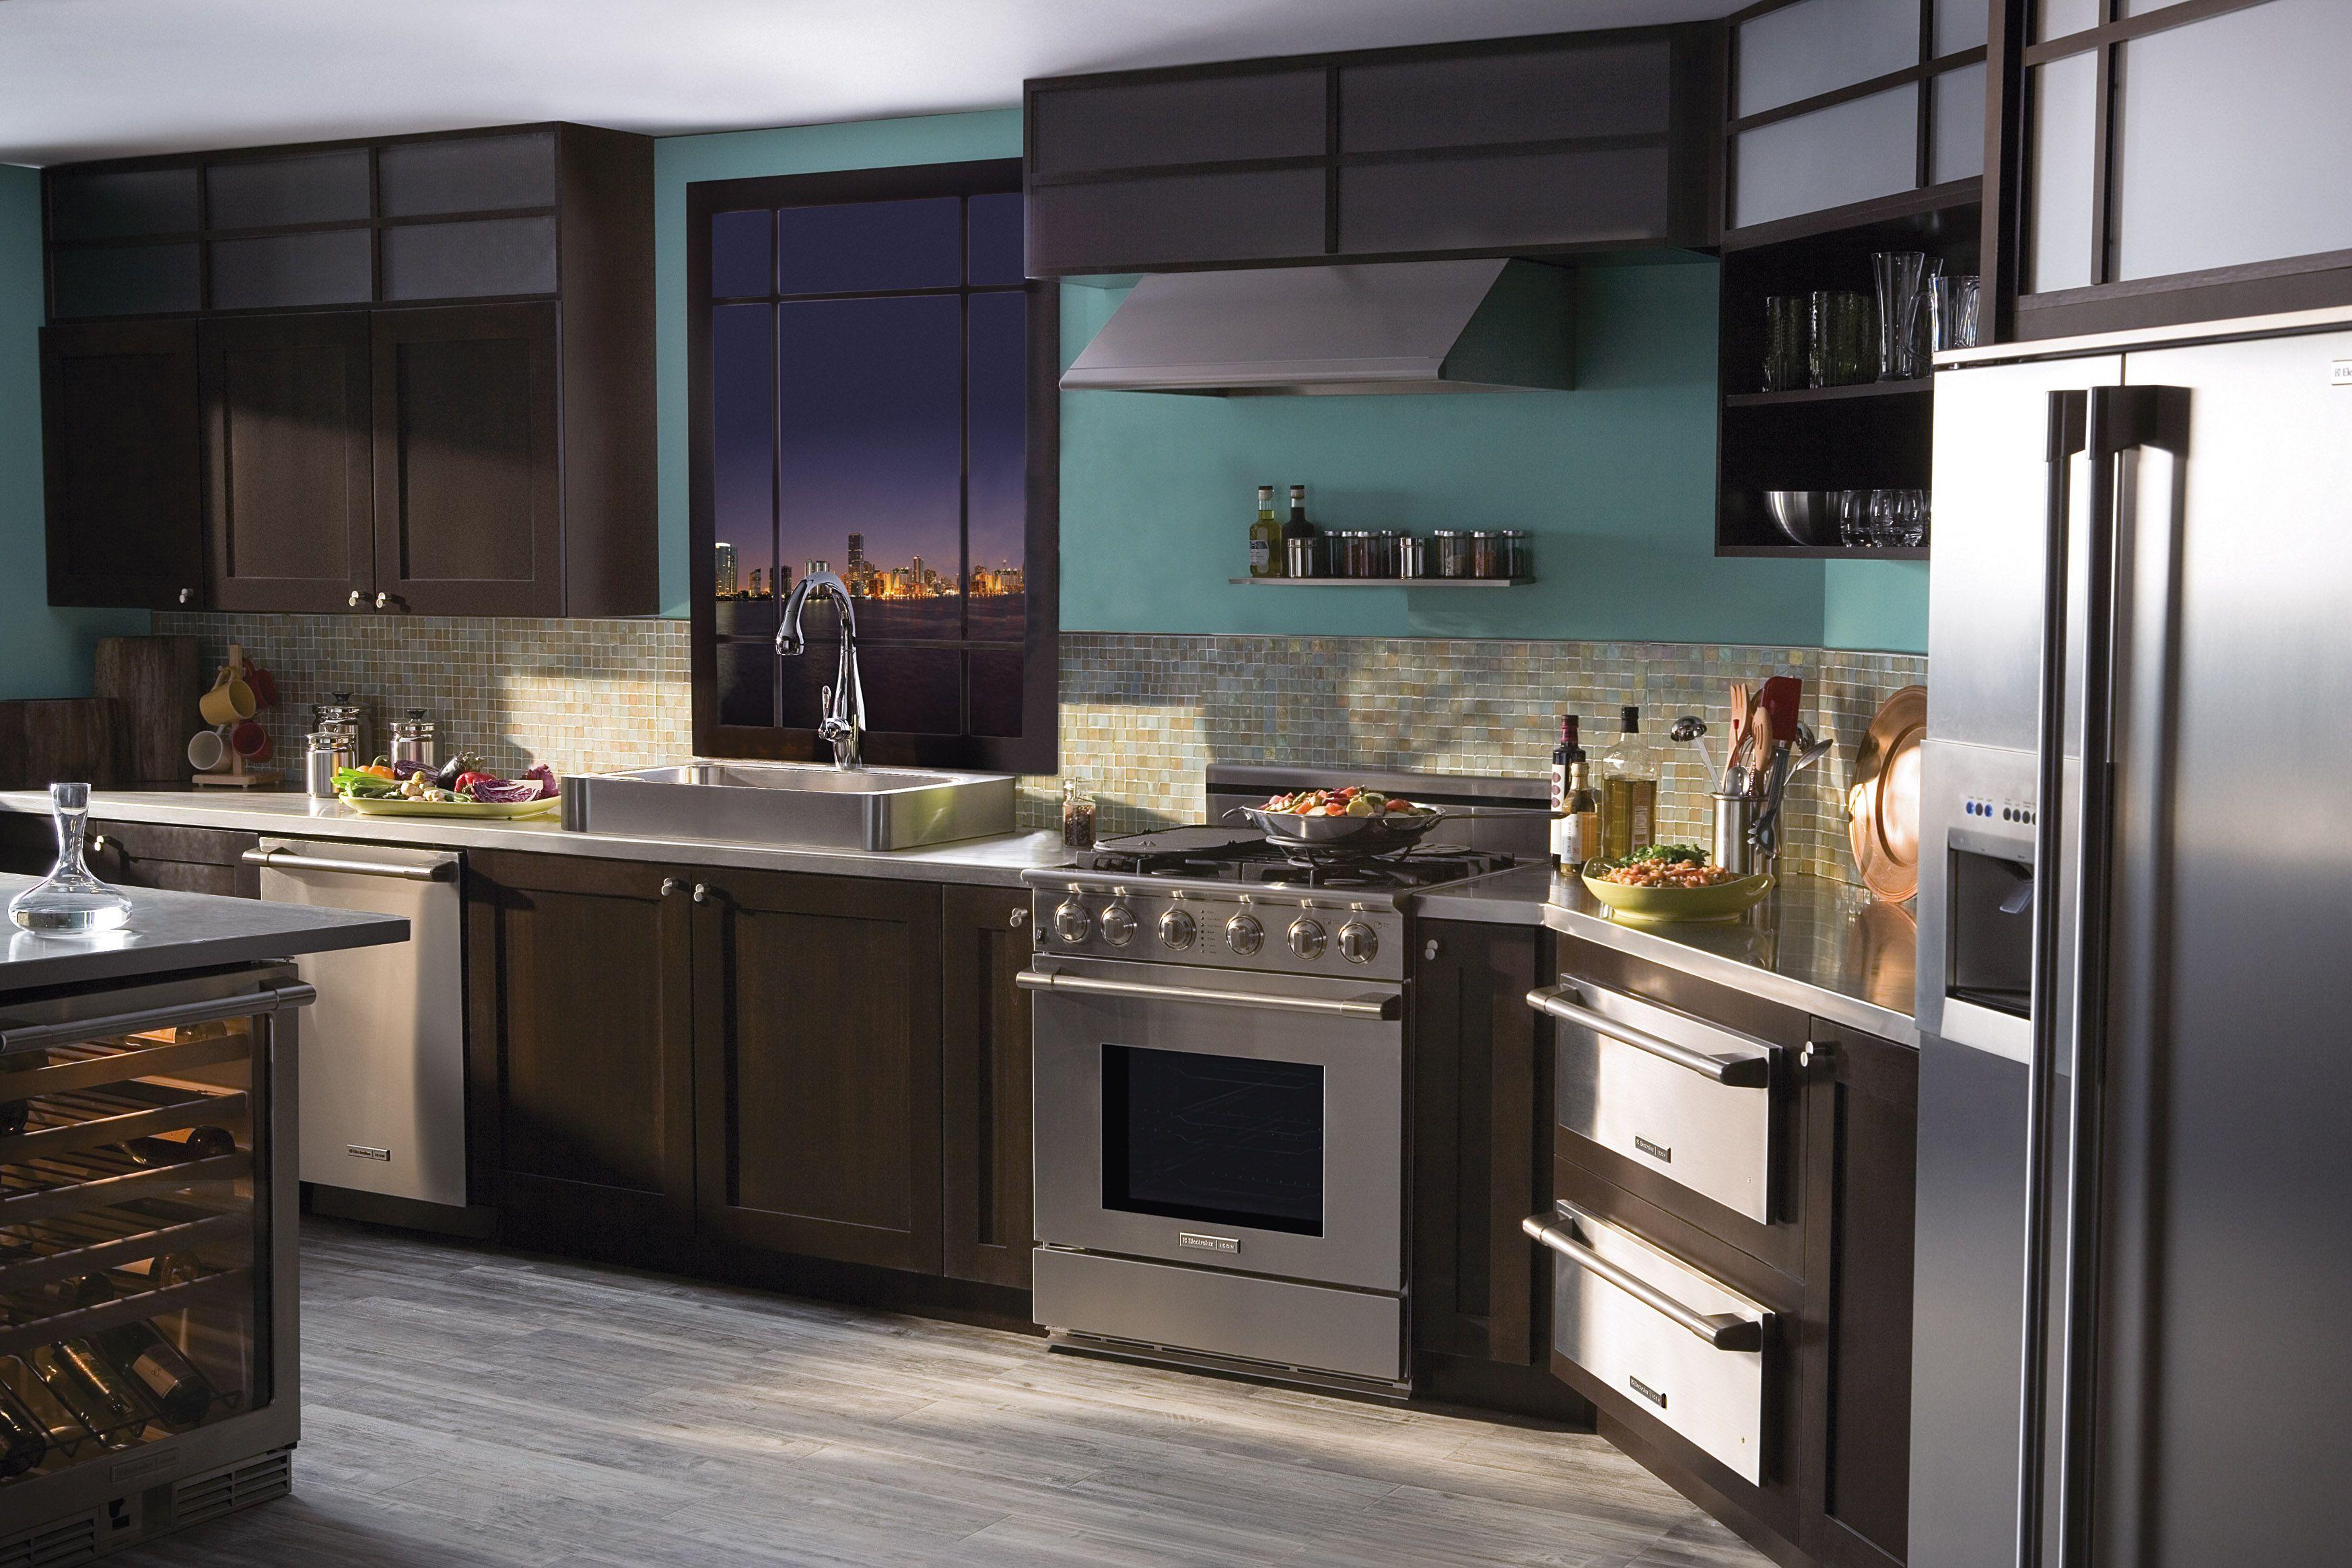 Dream Kitchen Design Classy Gorgeous Kitchen And View #dreamkitchen #kitchen #electrolux Inspiration